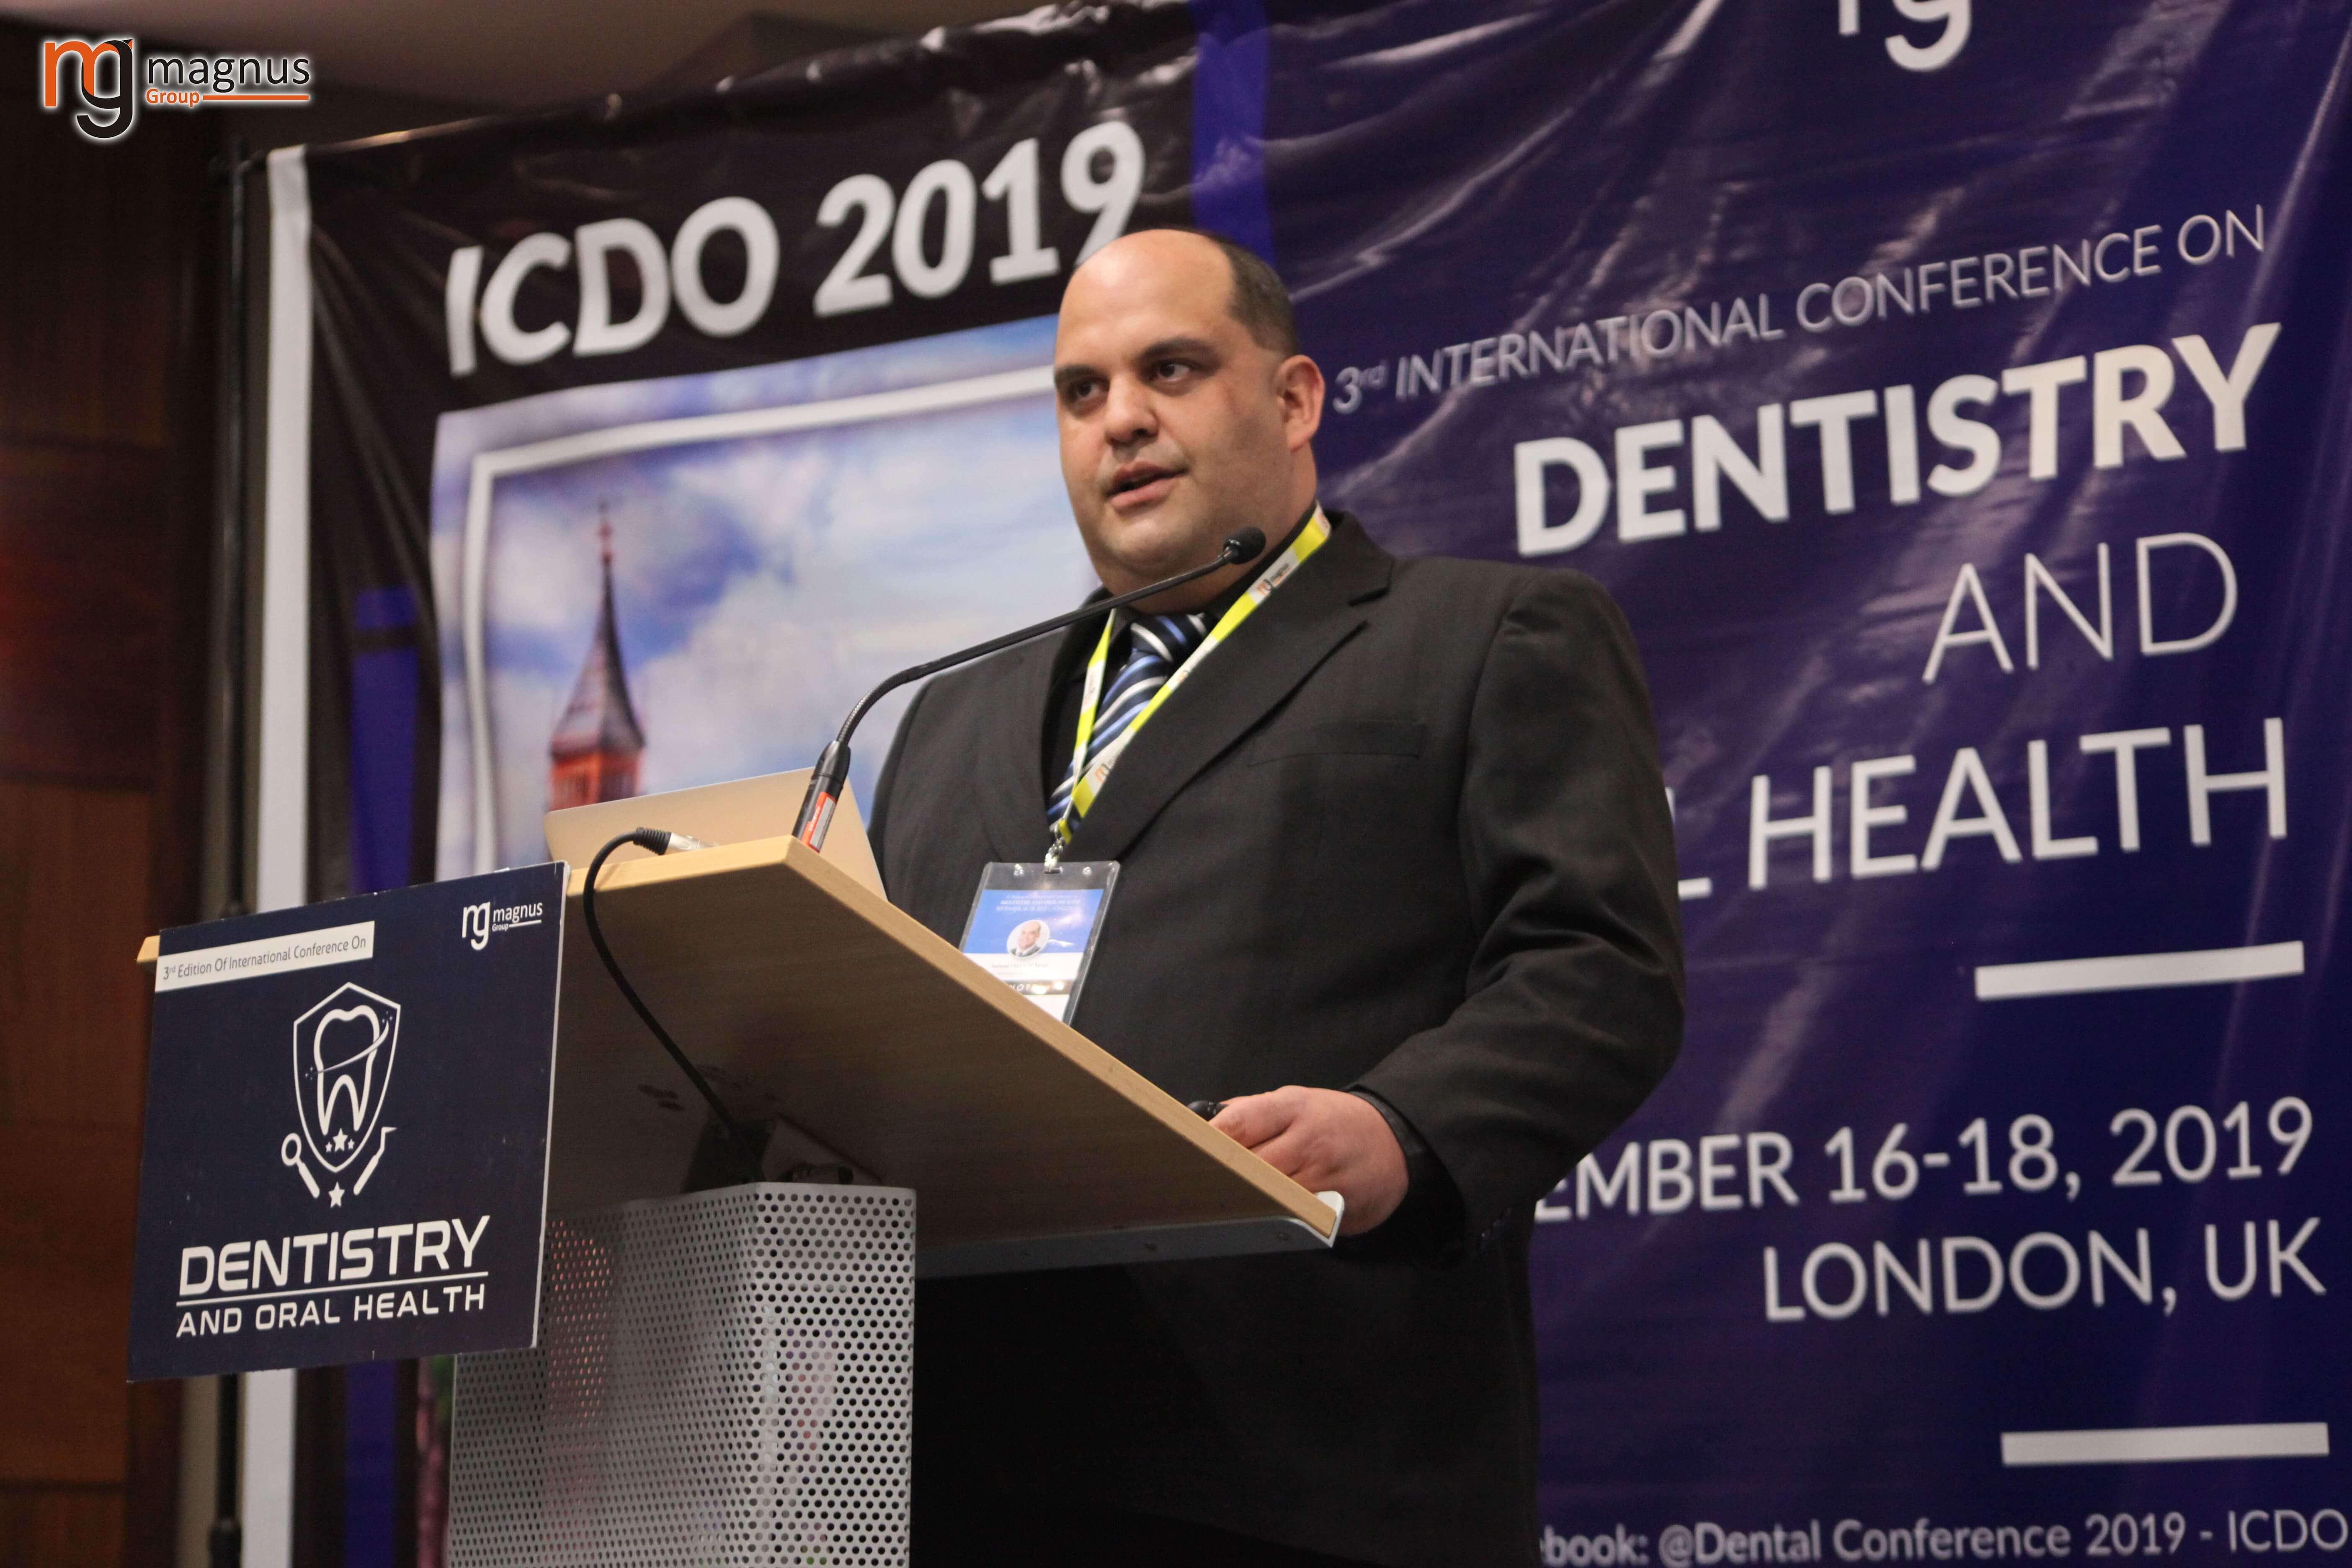 International Dental Conferences- Antonio Otavio M Neves